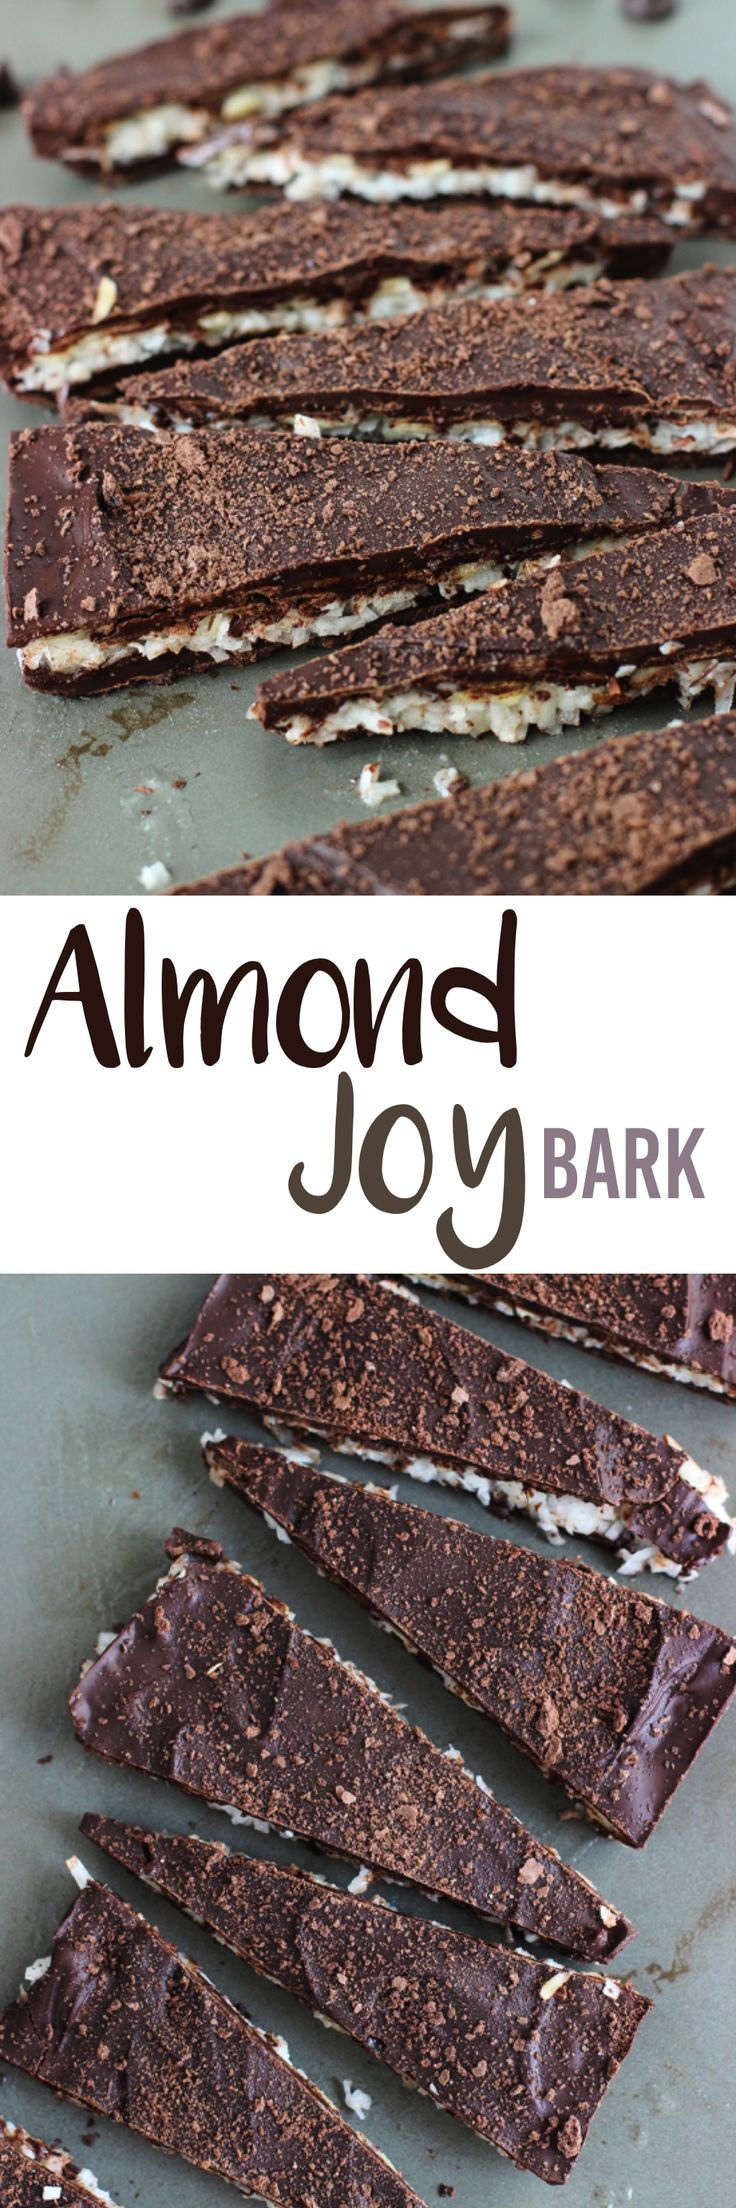 Almond Joy Bark - a no-bake bark that tastes like the candy favorite! mysequinedlife.com